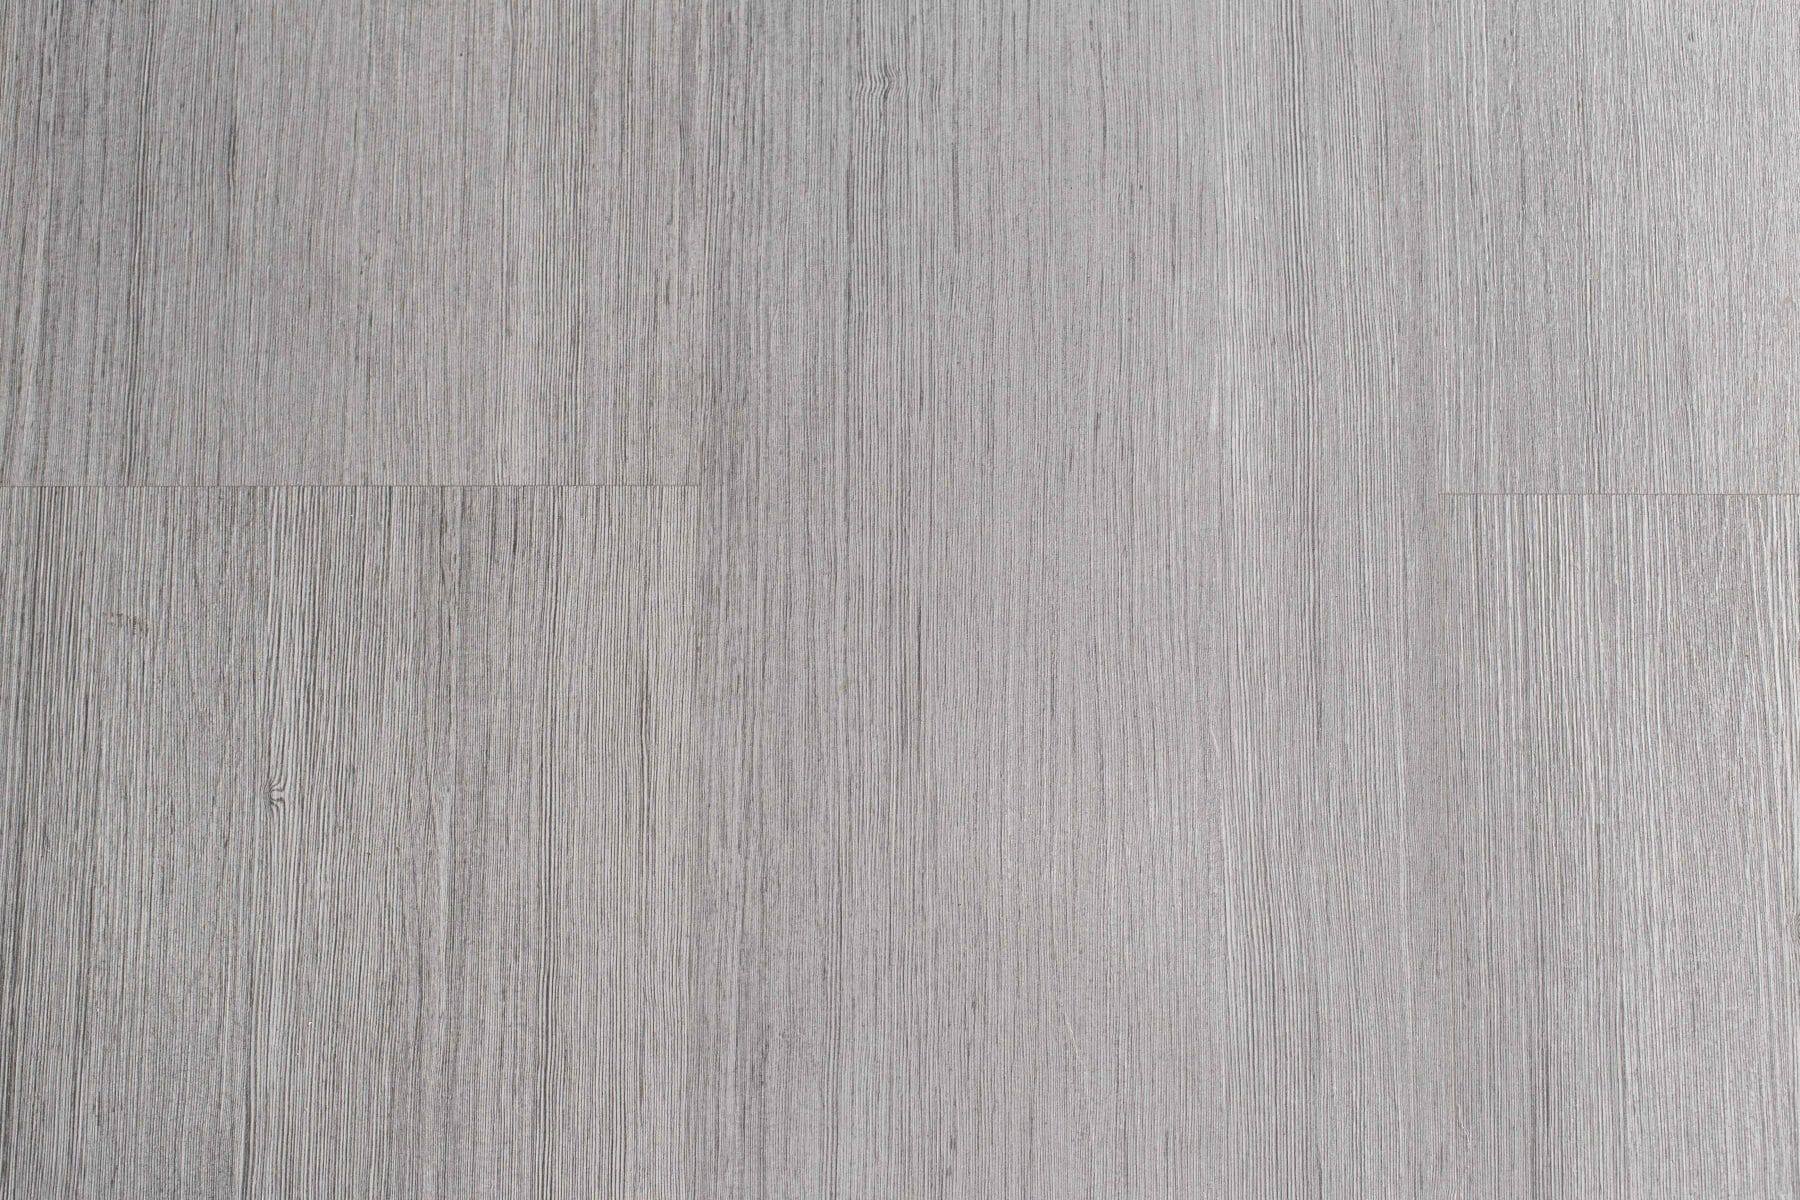 Simplex Grey Linen Vinyl Flooring Igloo Surfaces